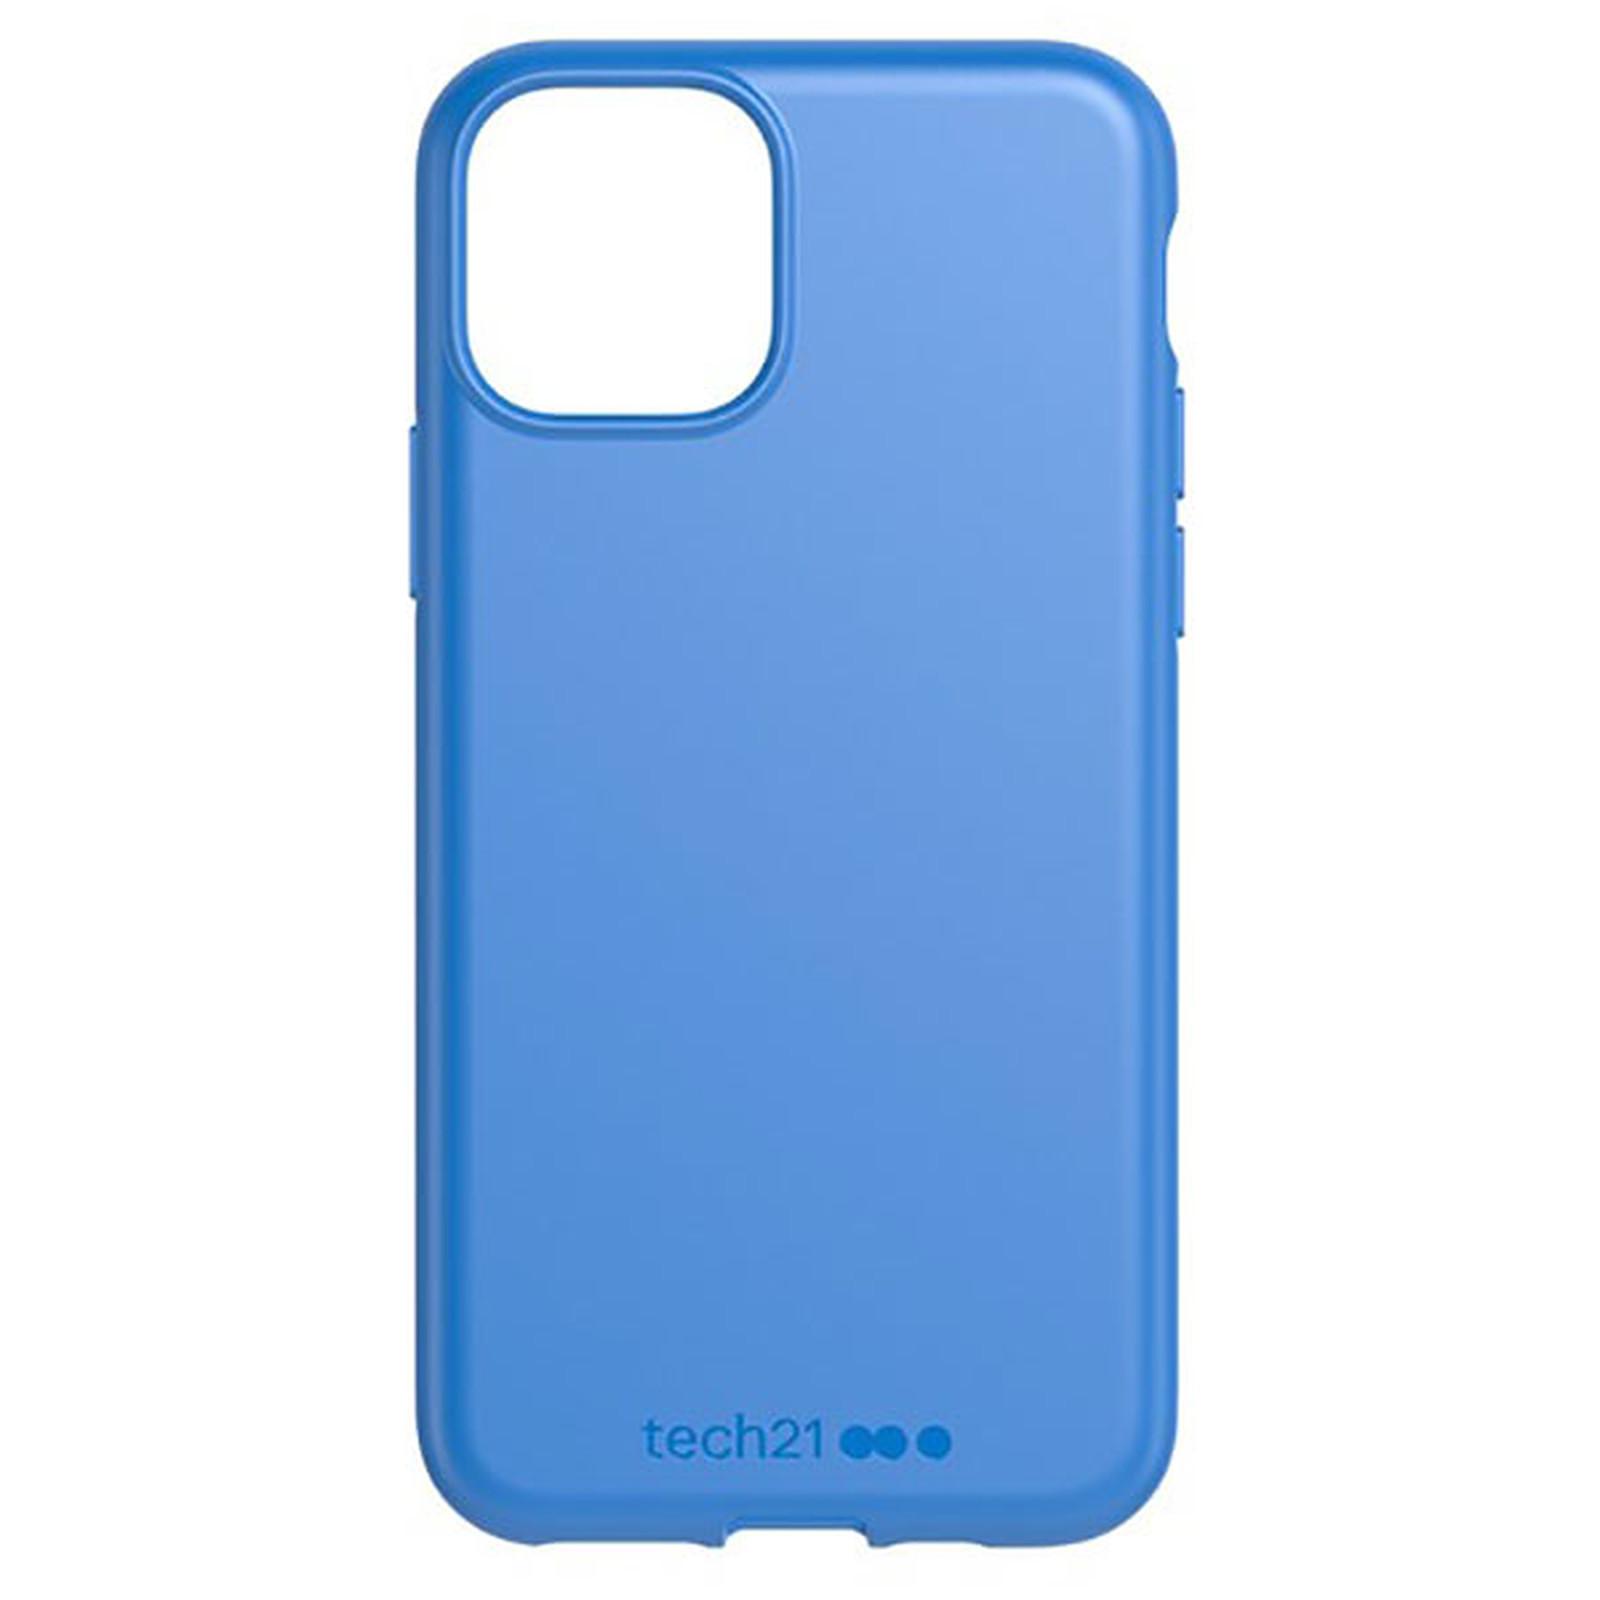 Tech21 Studio Colour Bleu Apple iPhone 11